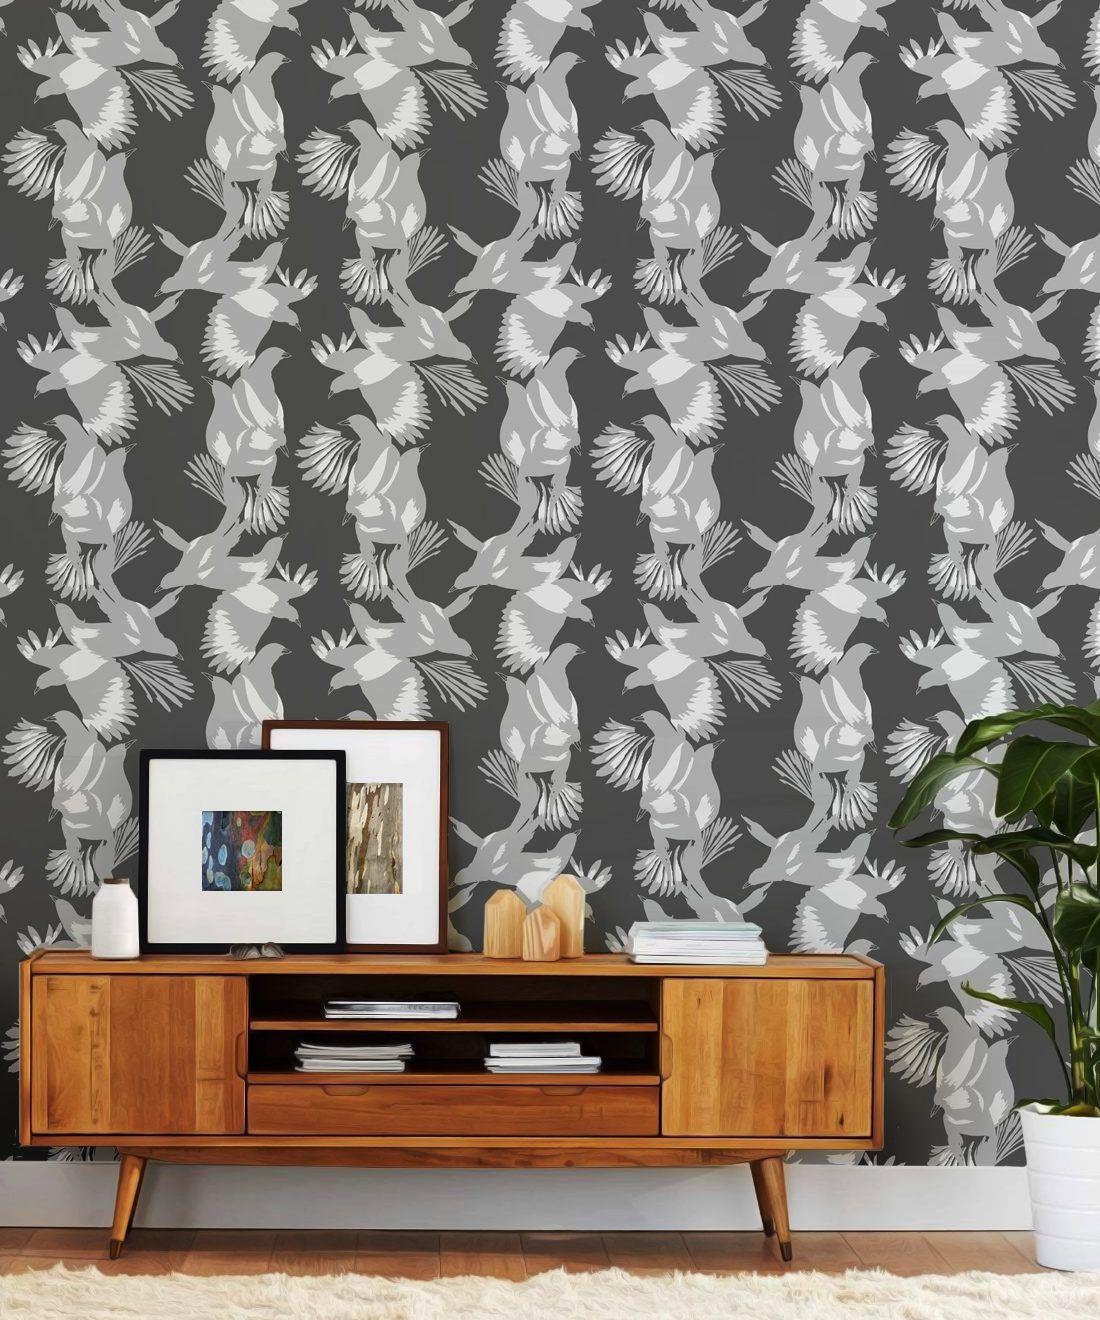 Magpie Wallpaper • Milton & King • Kingdom Home • Bird Wallpaper • Slate Insitu